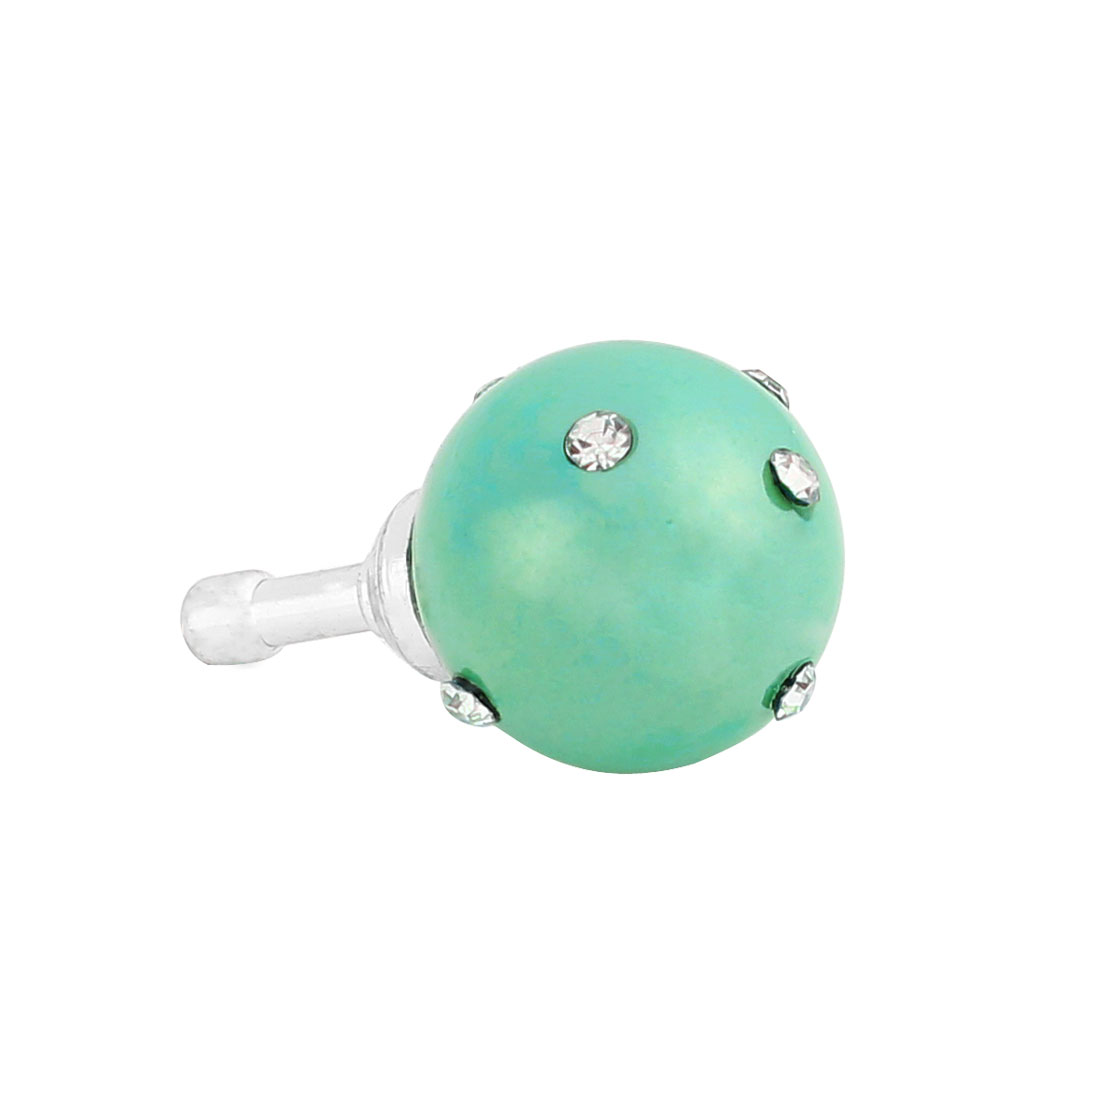 Baby Blue Faux Pearl Rhinestone 3.5mm Earphone Anti Dust Plug Cap Stopper for Phone